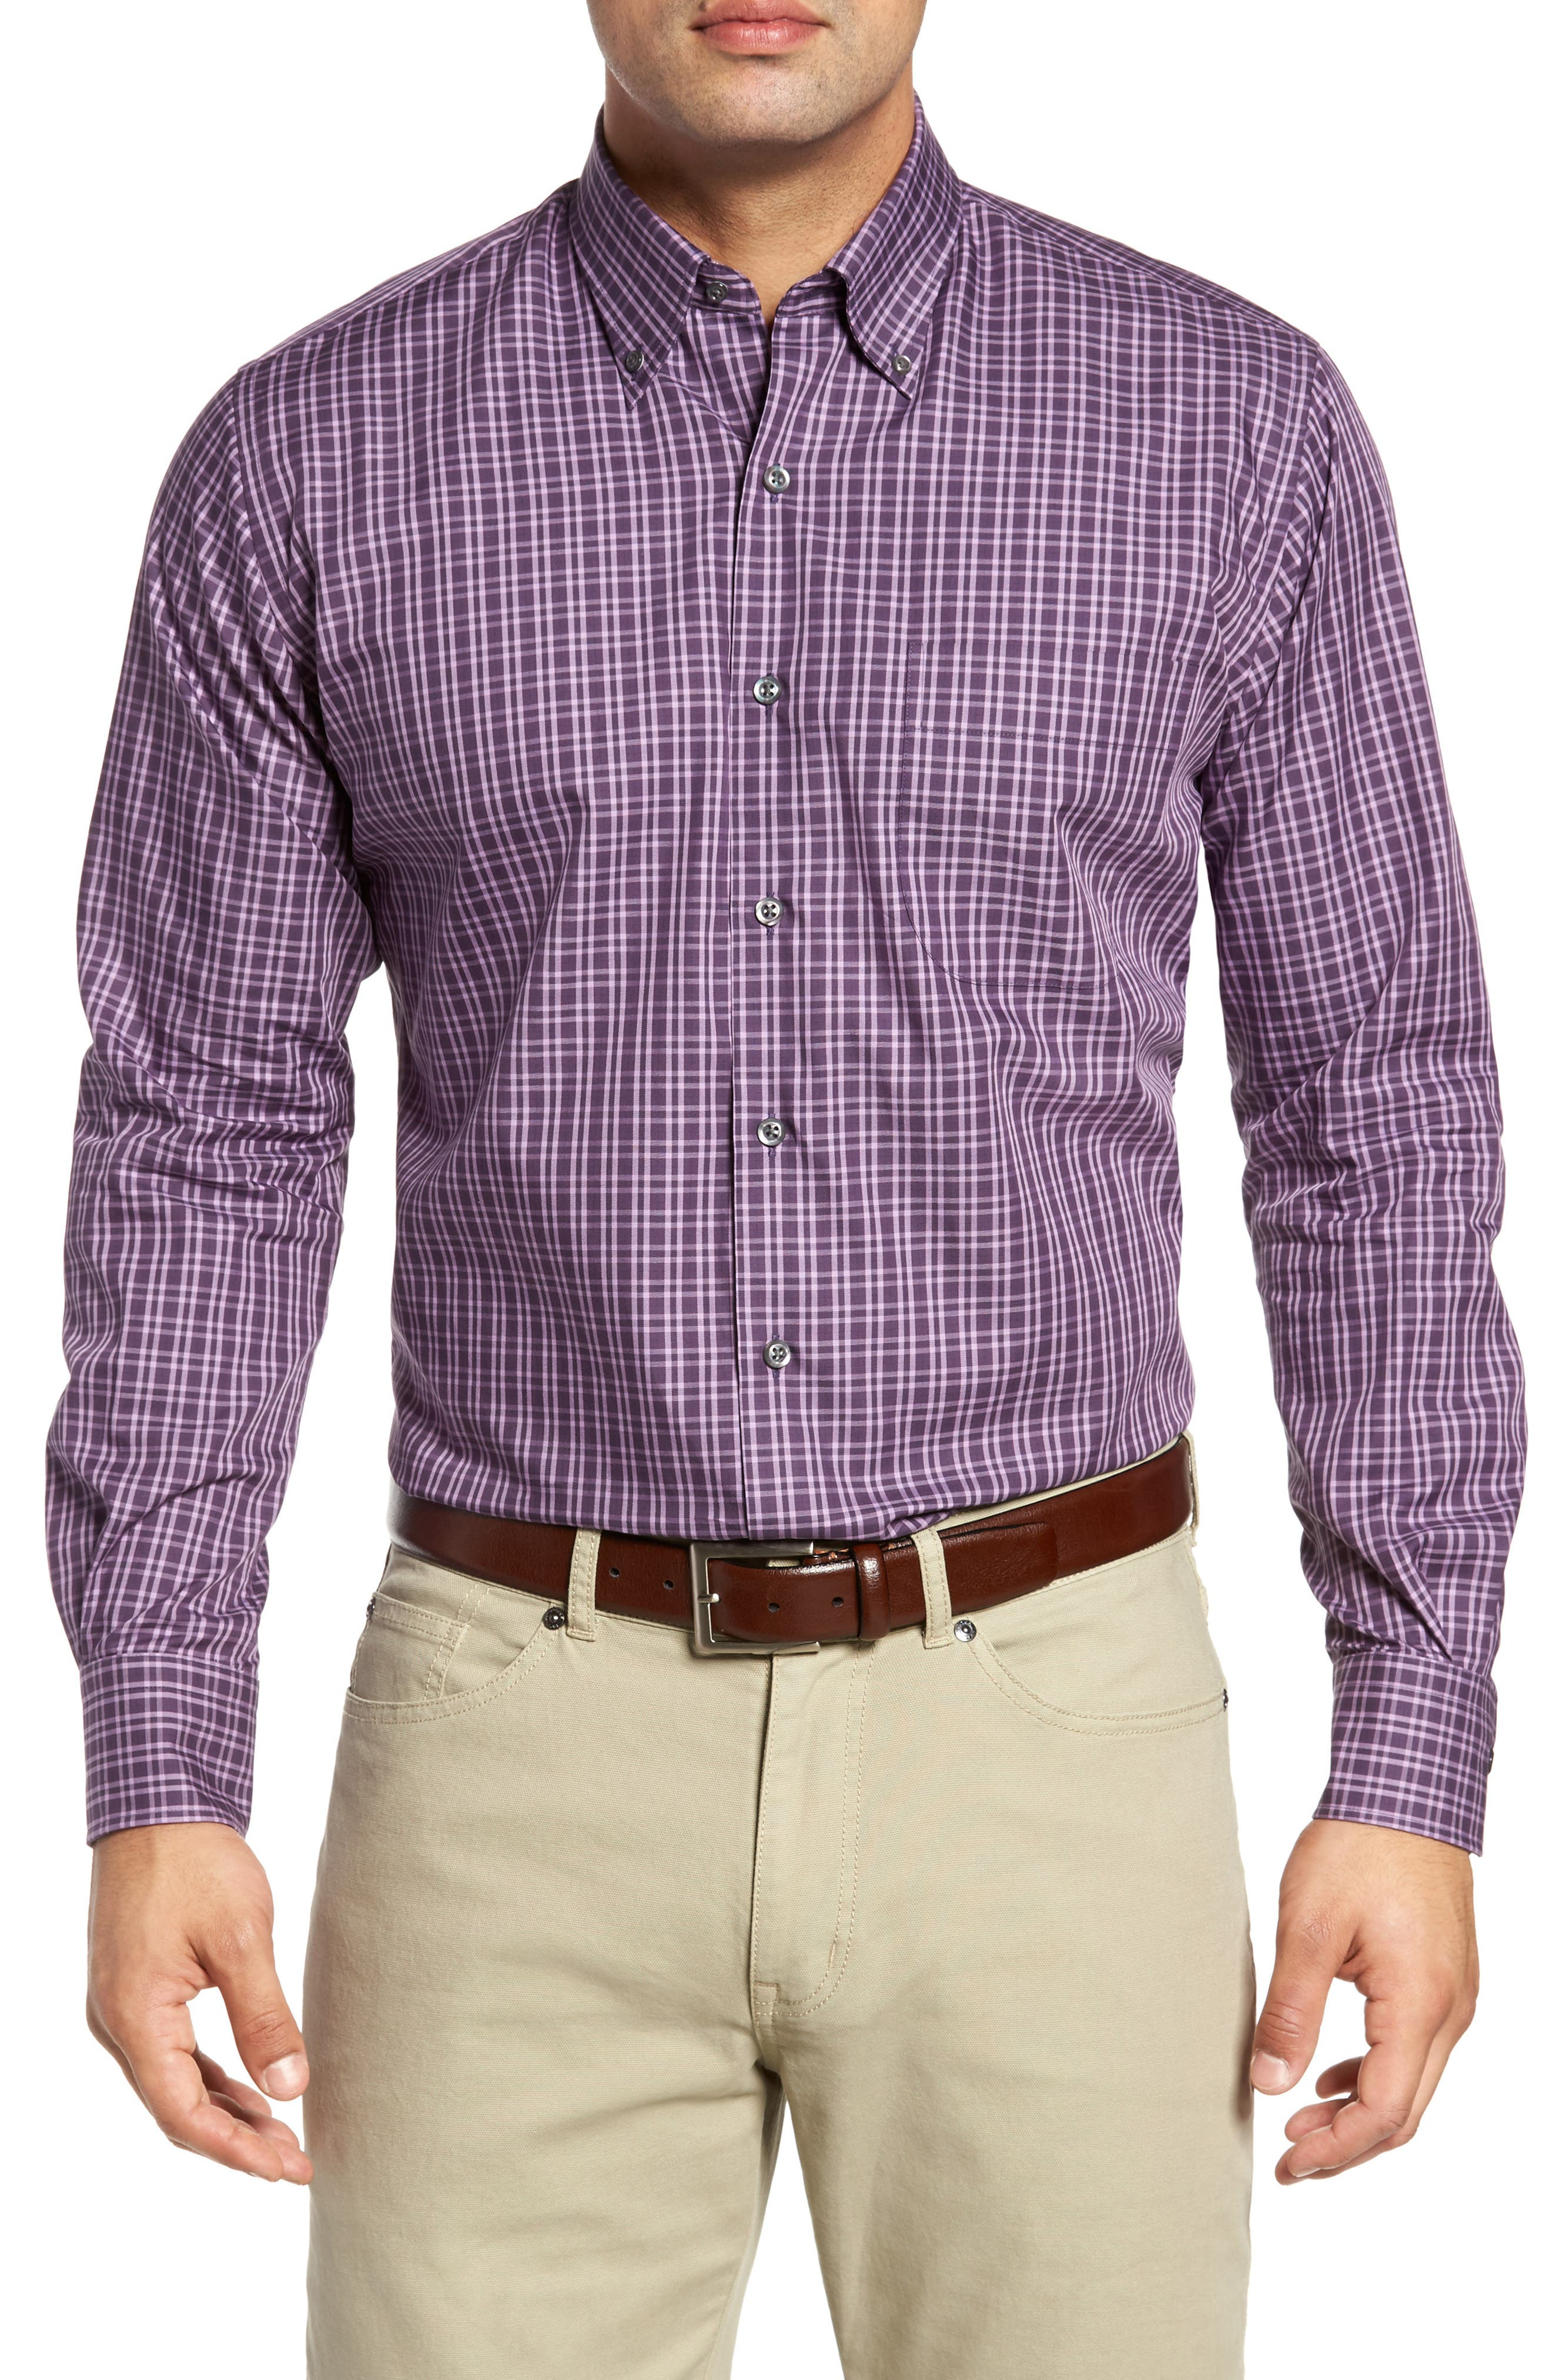 Main Image - Peter Millar Autumn Check Regular Fit Sport Shirt